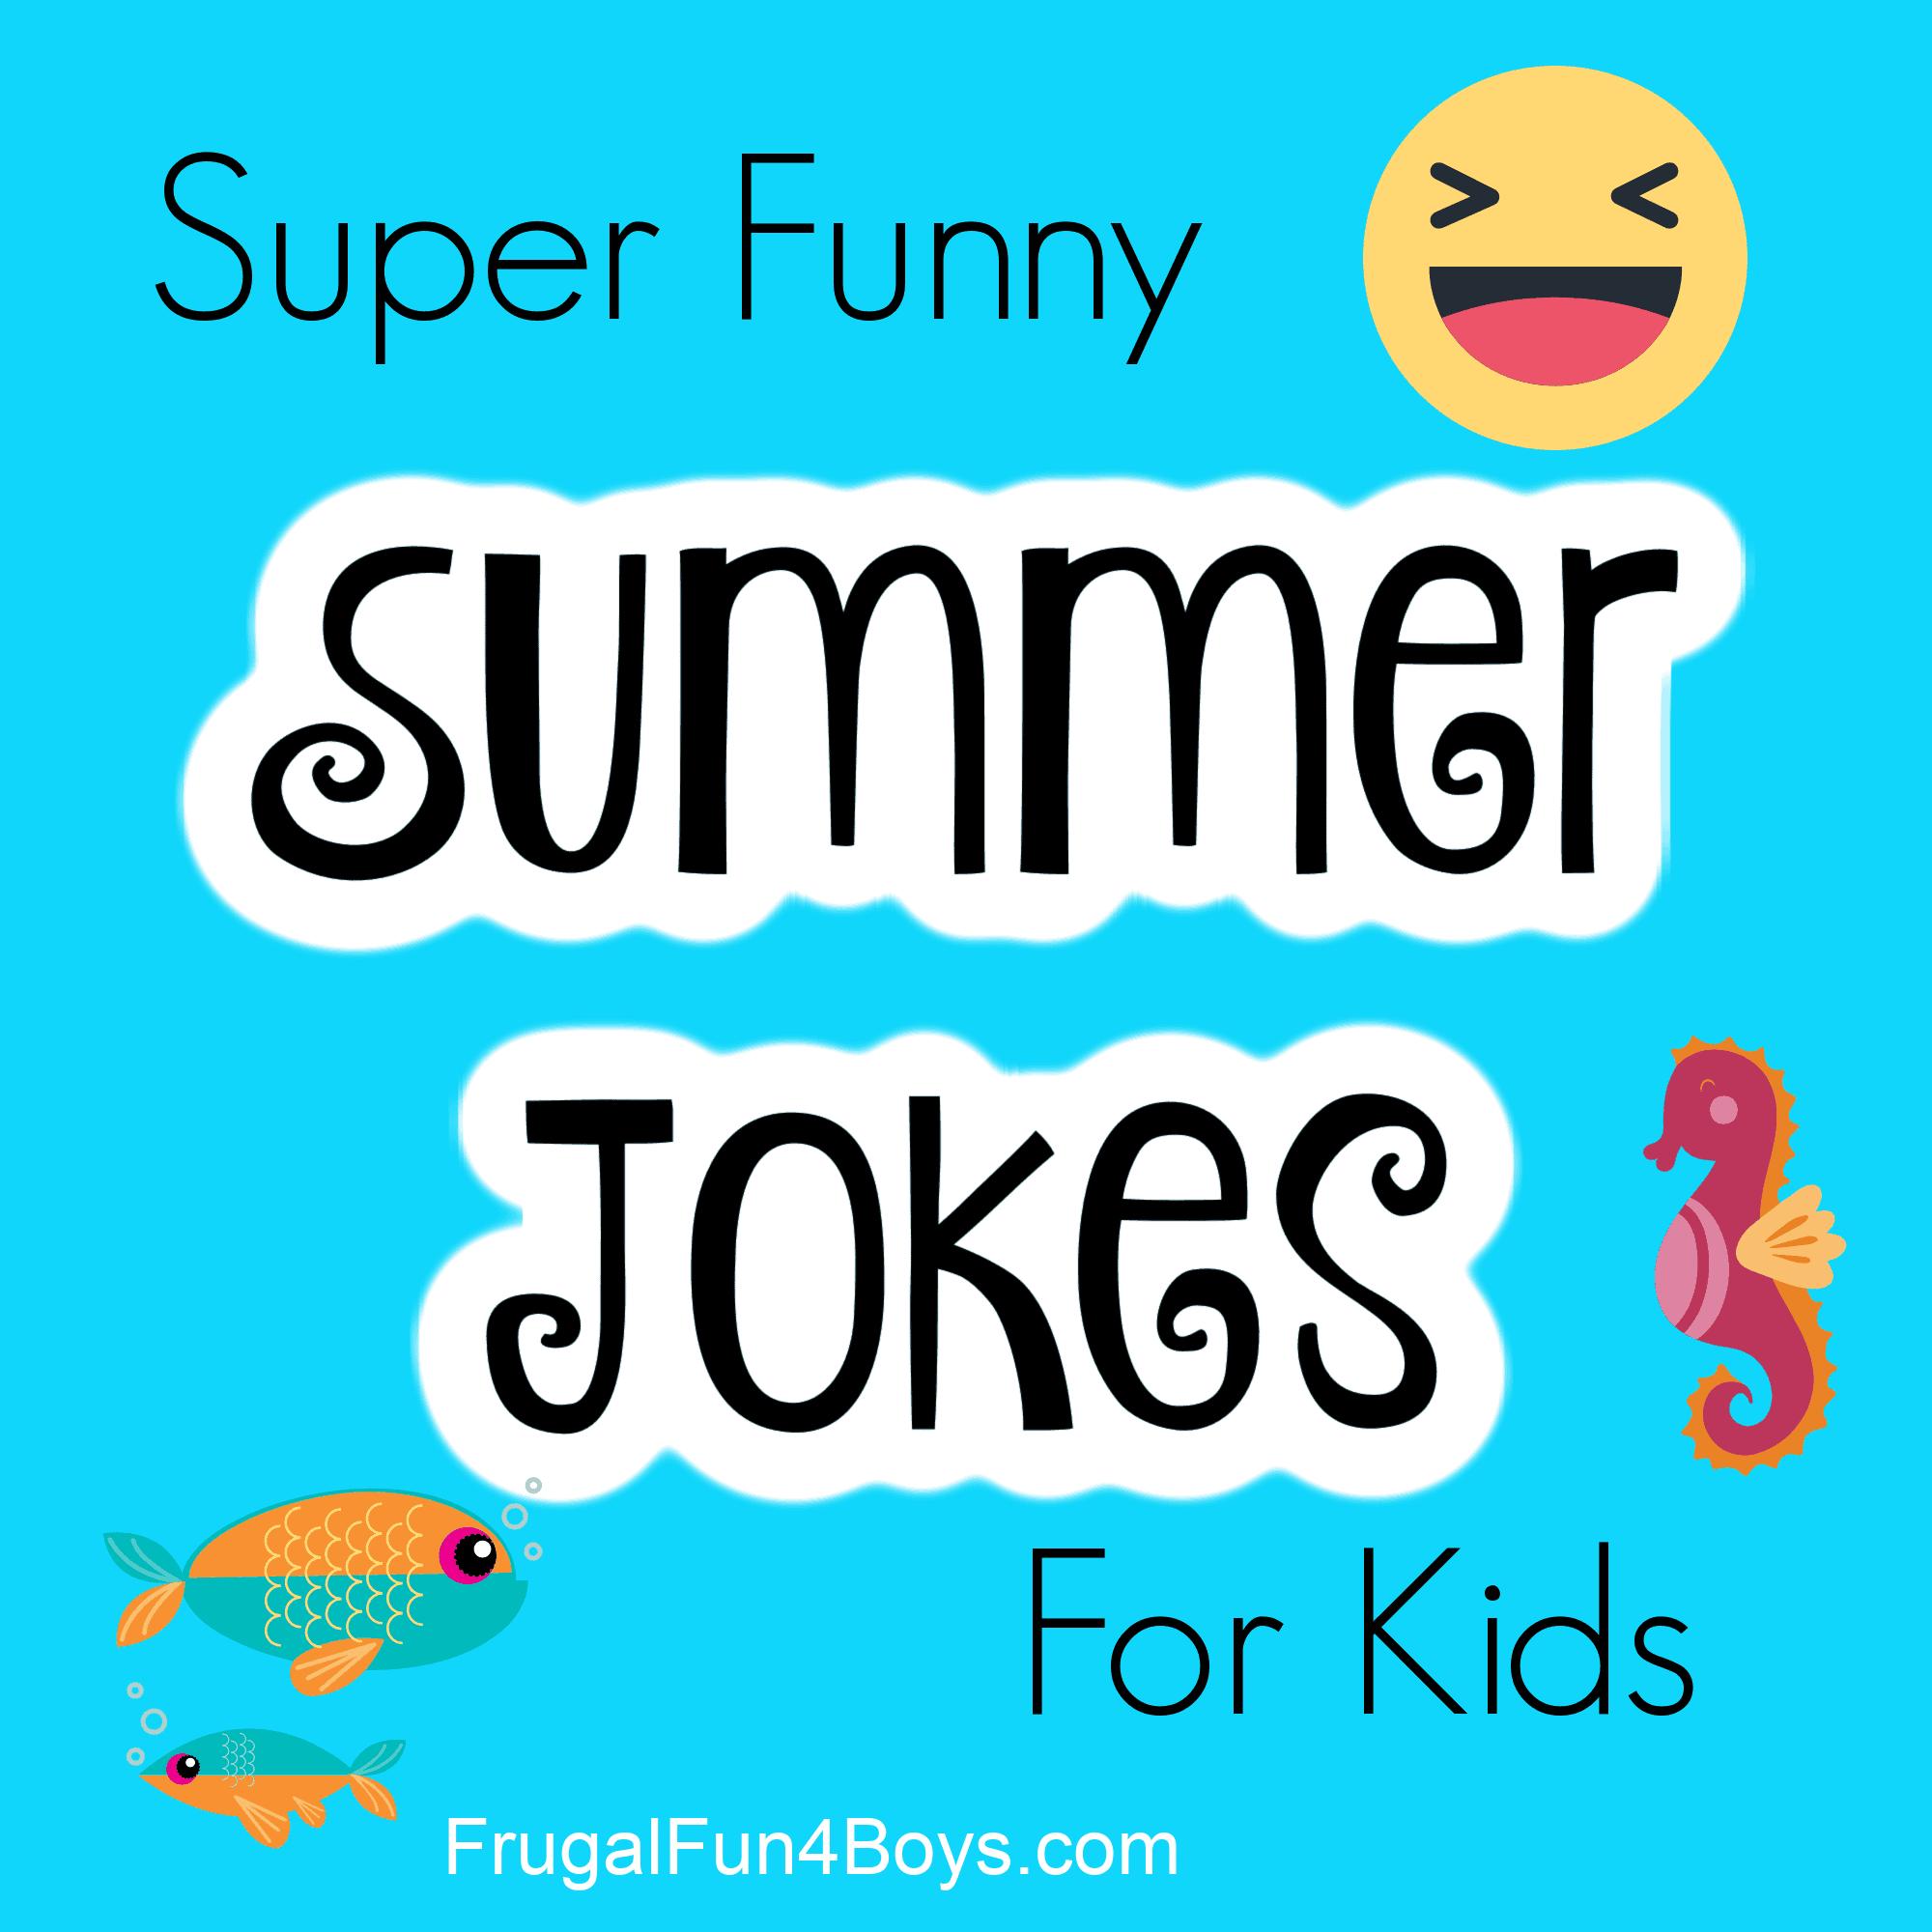 Hilarious Jokes 4